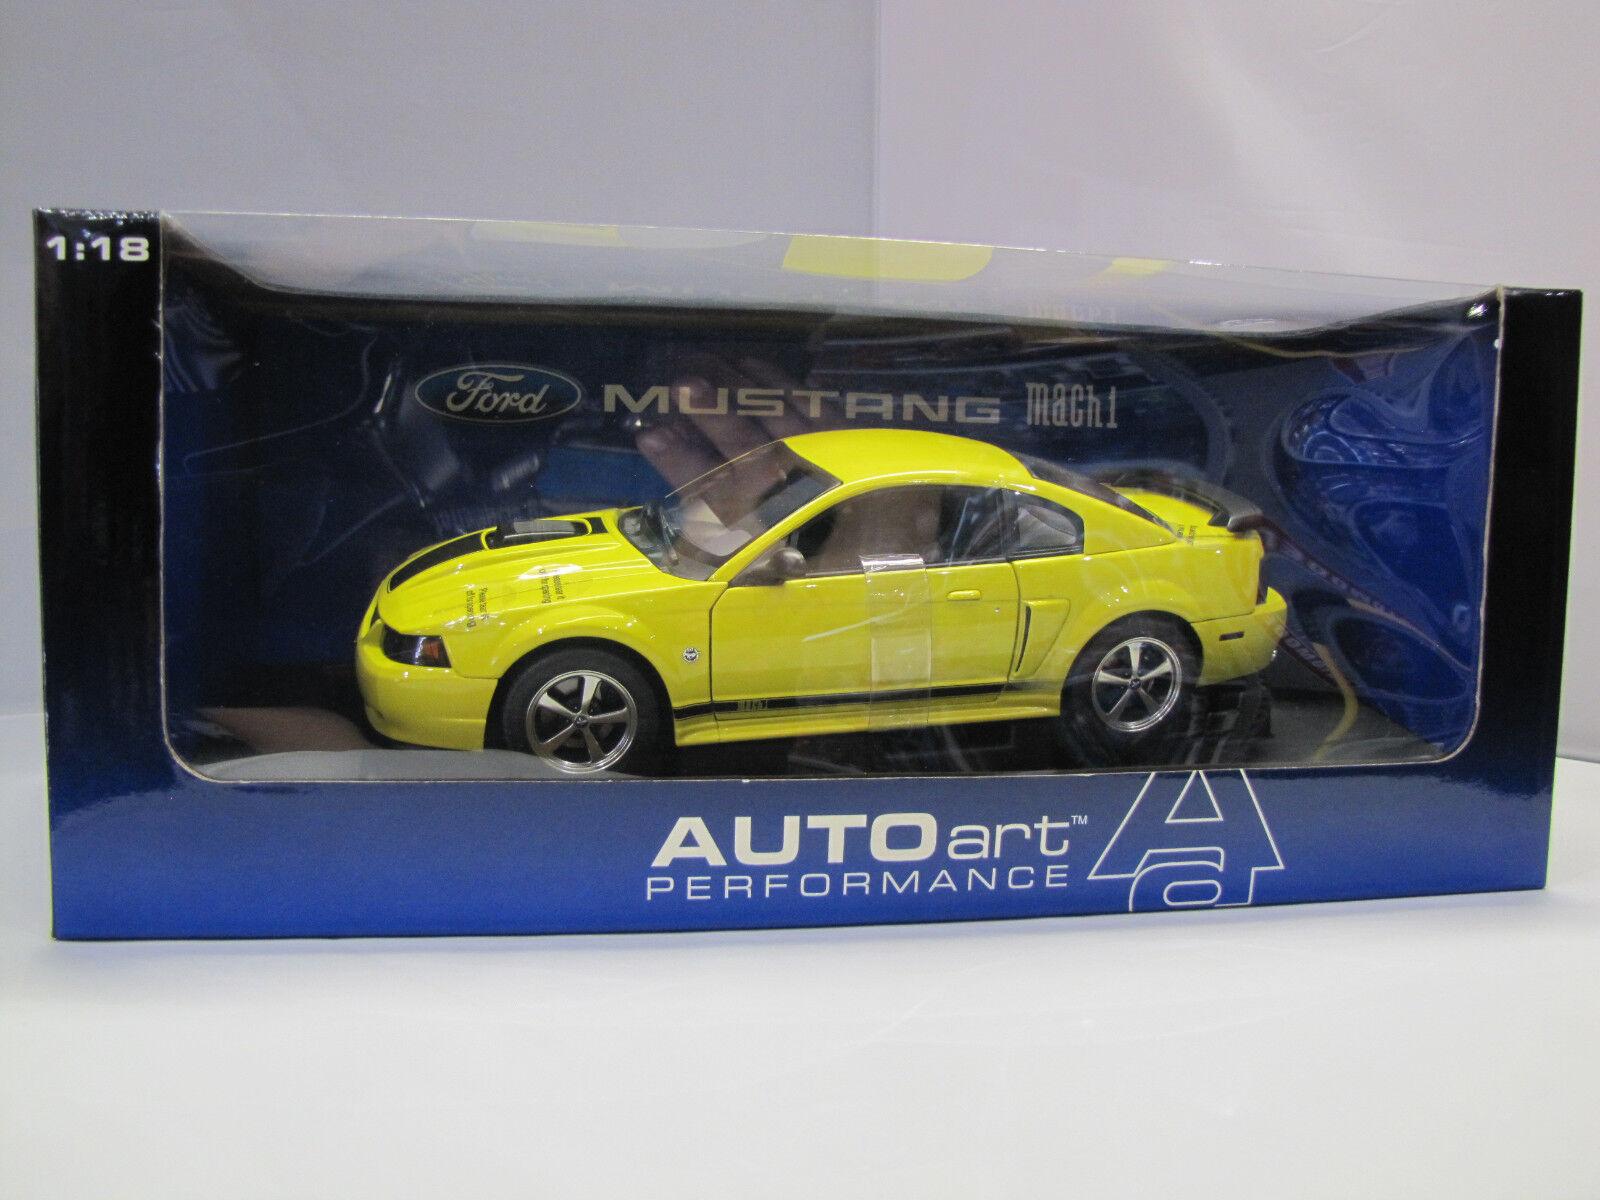 73006 AUTOart Ford Mustang mach 1  40th Anniversary 2004 Urleo Gituttio 1 18